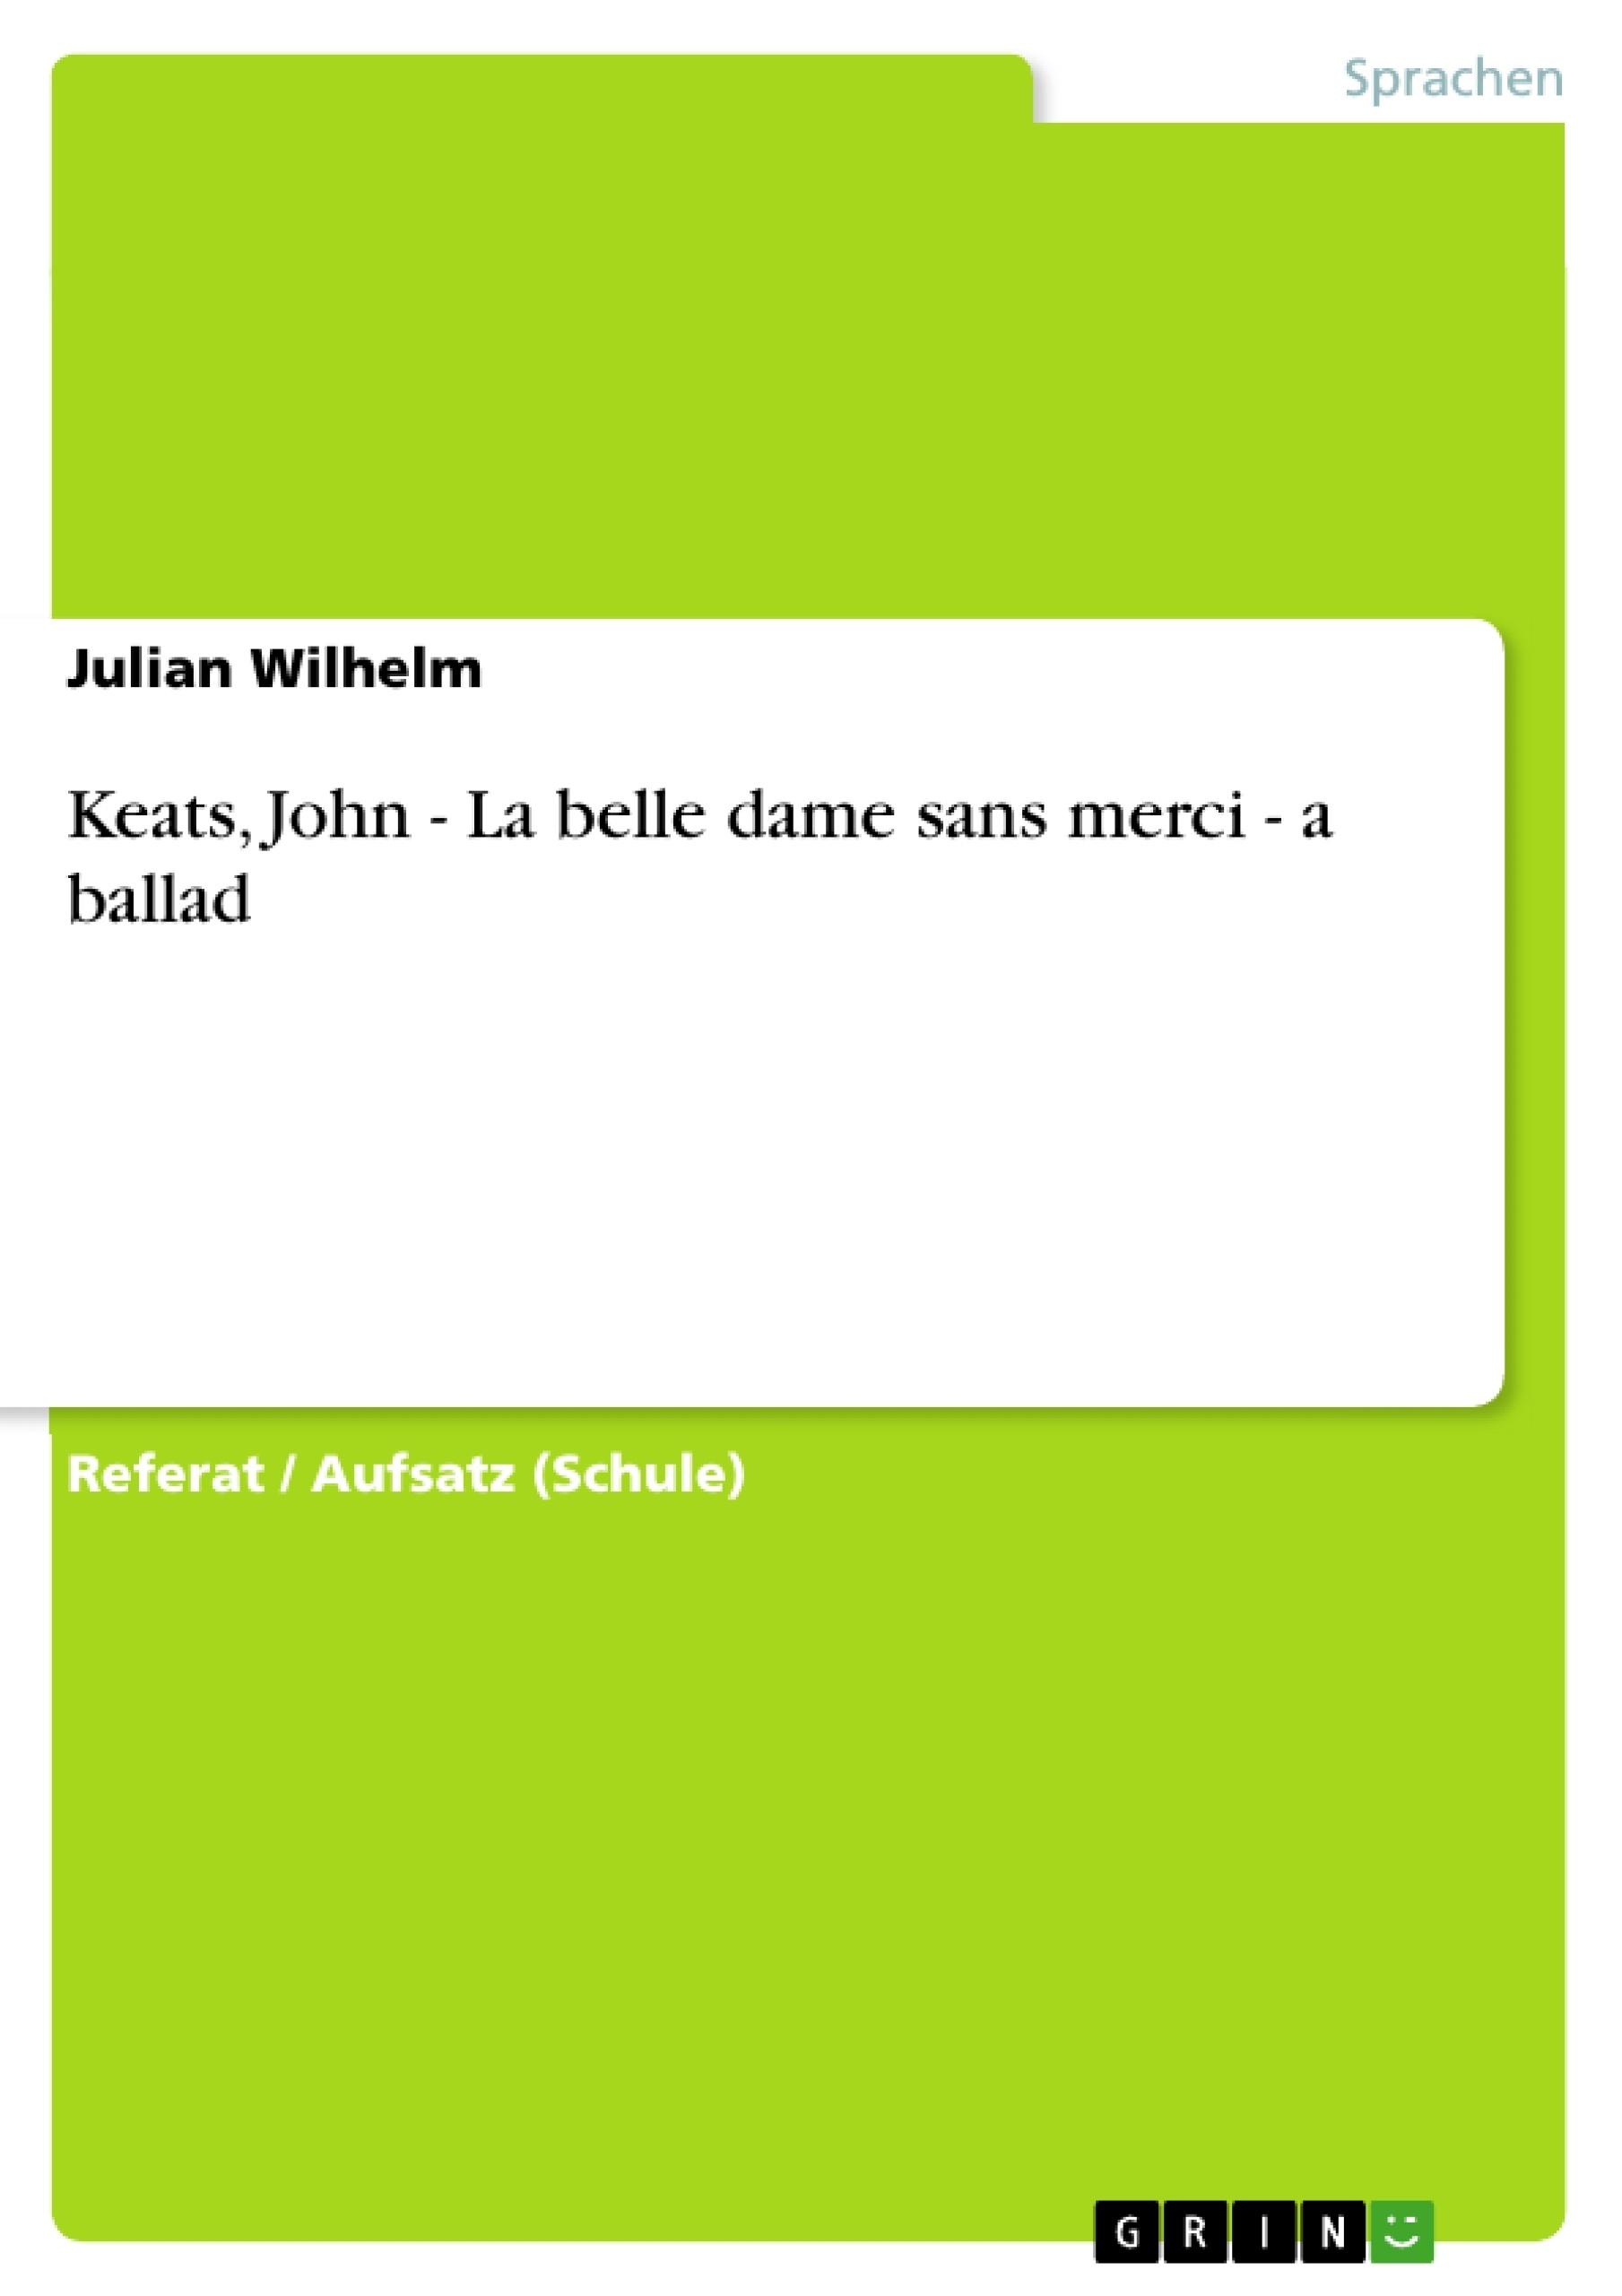 Titel: Keats, John - La belle dame sans merci - a ballad